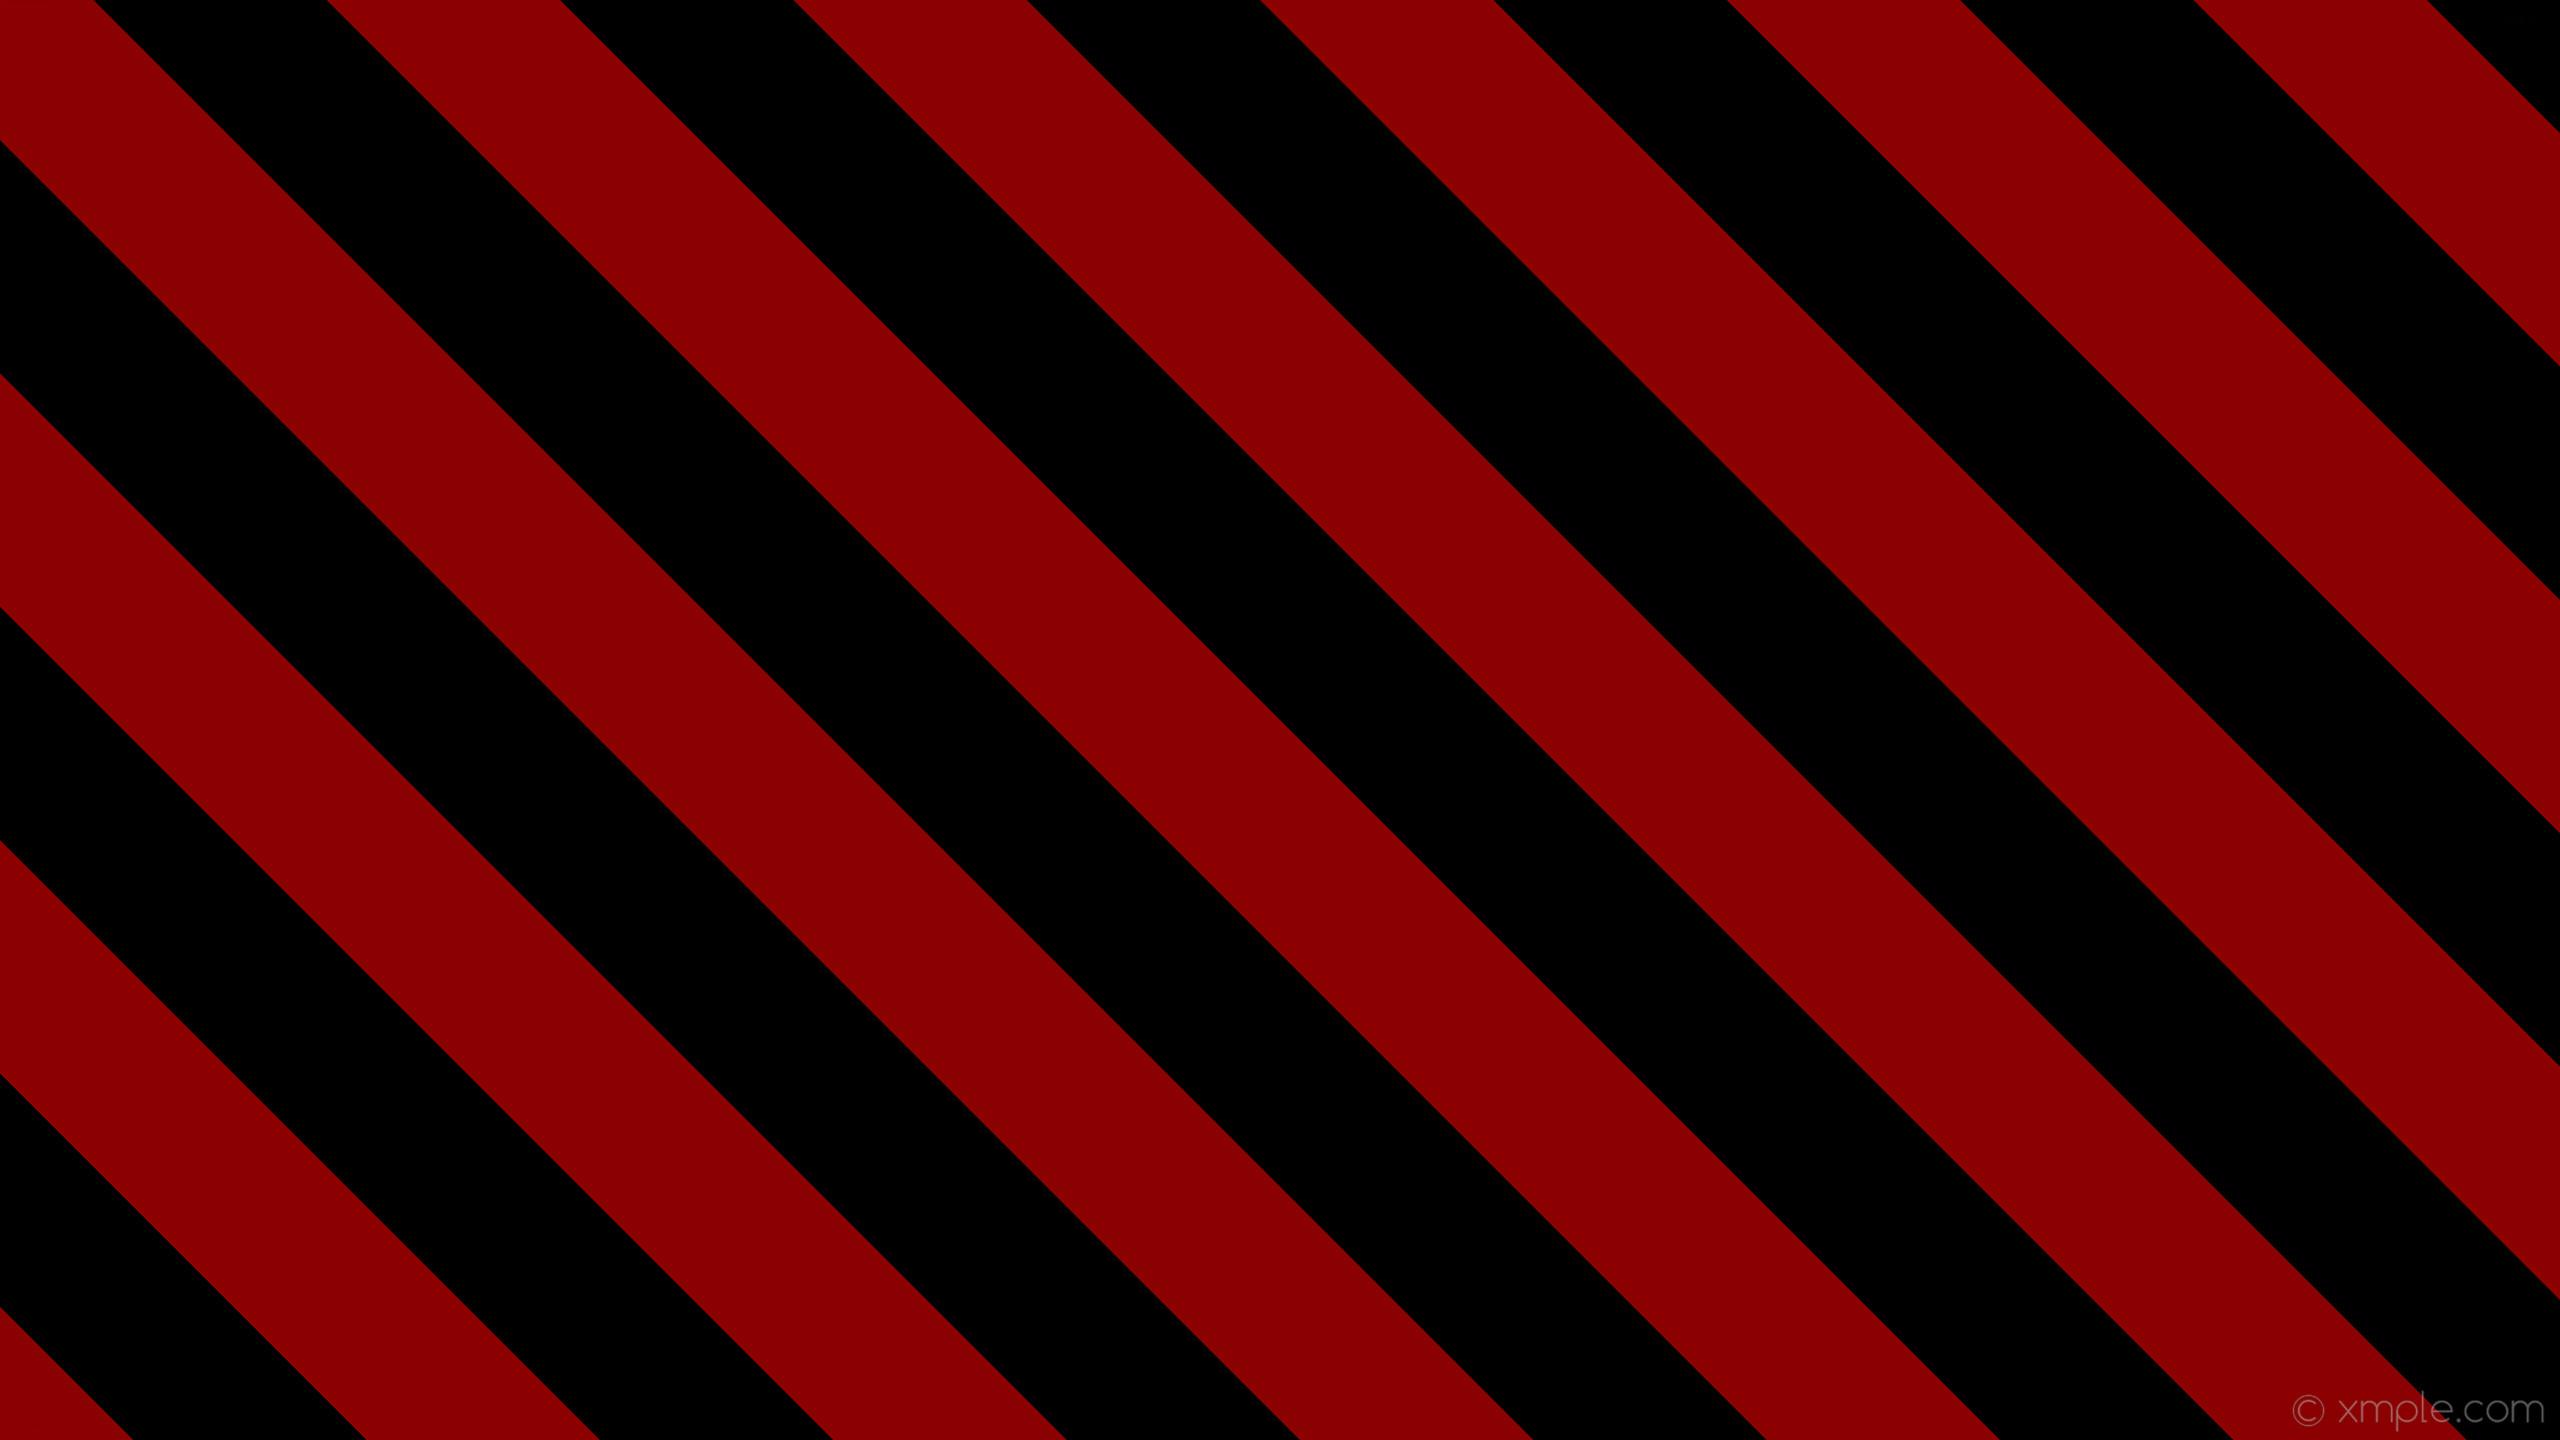 wallpaper stripes red lines black streaks dark red #8b0000 #000000 diagonal  315° 165px